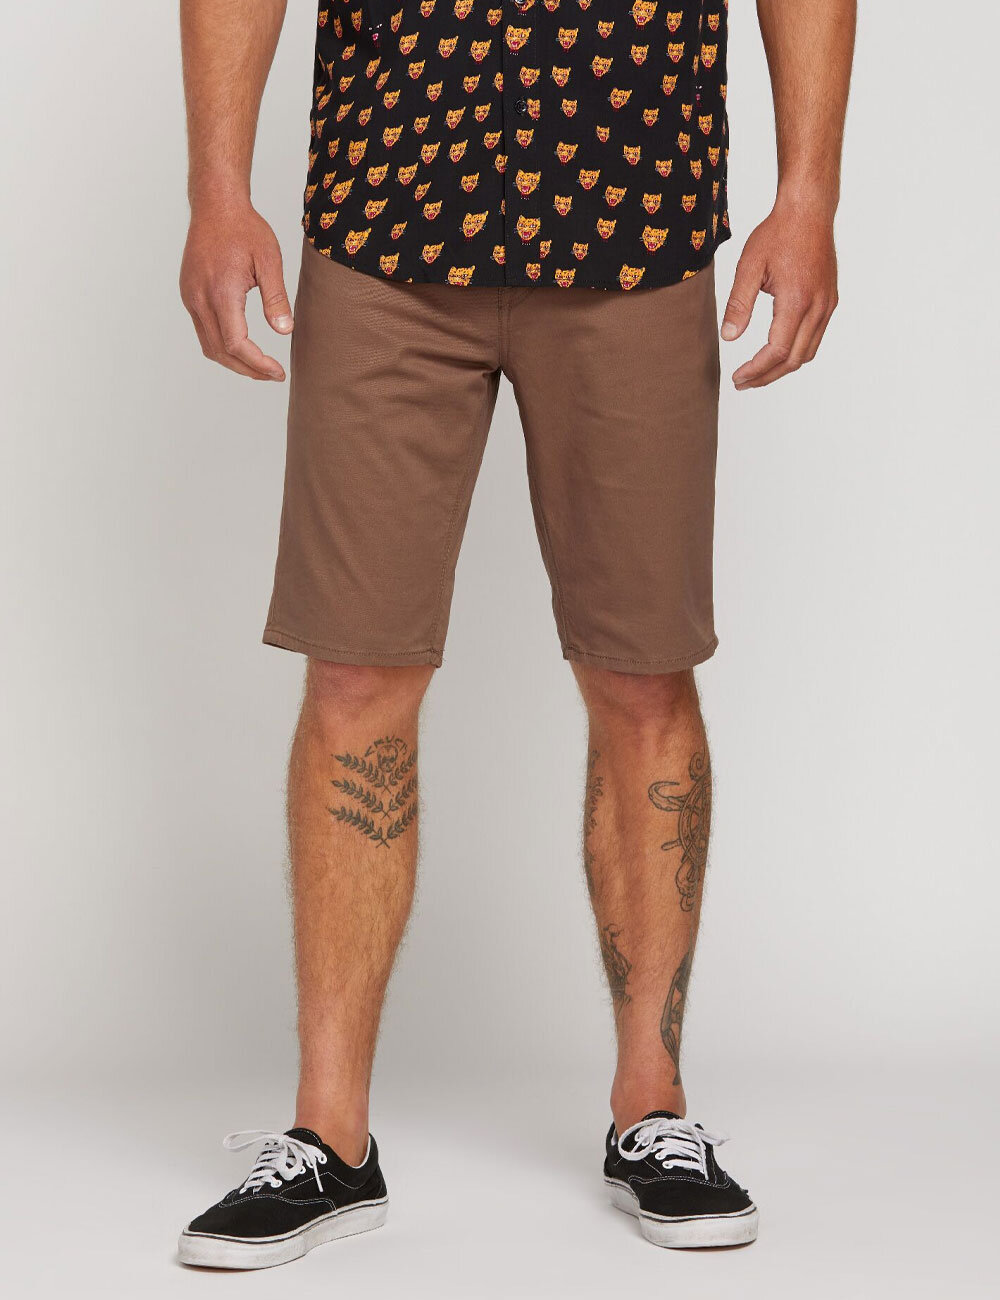 3cf7c064ca SOLVER LITE 5 POCKET SHORT - Men's Shorts & Pants | Surf & Skate ...